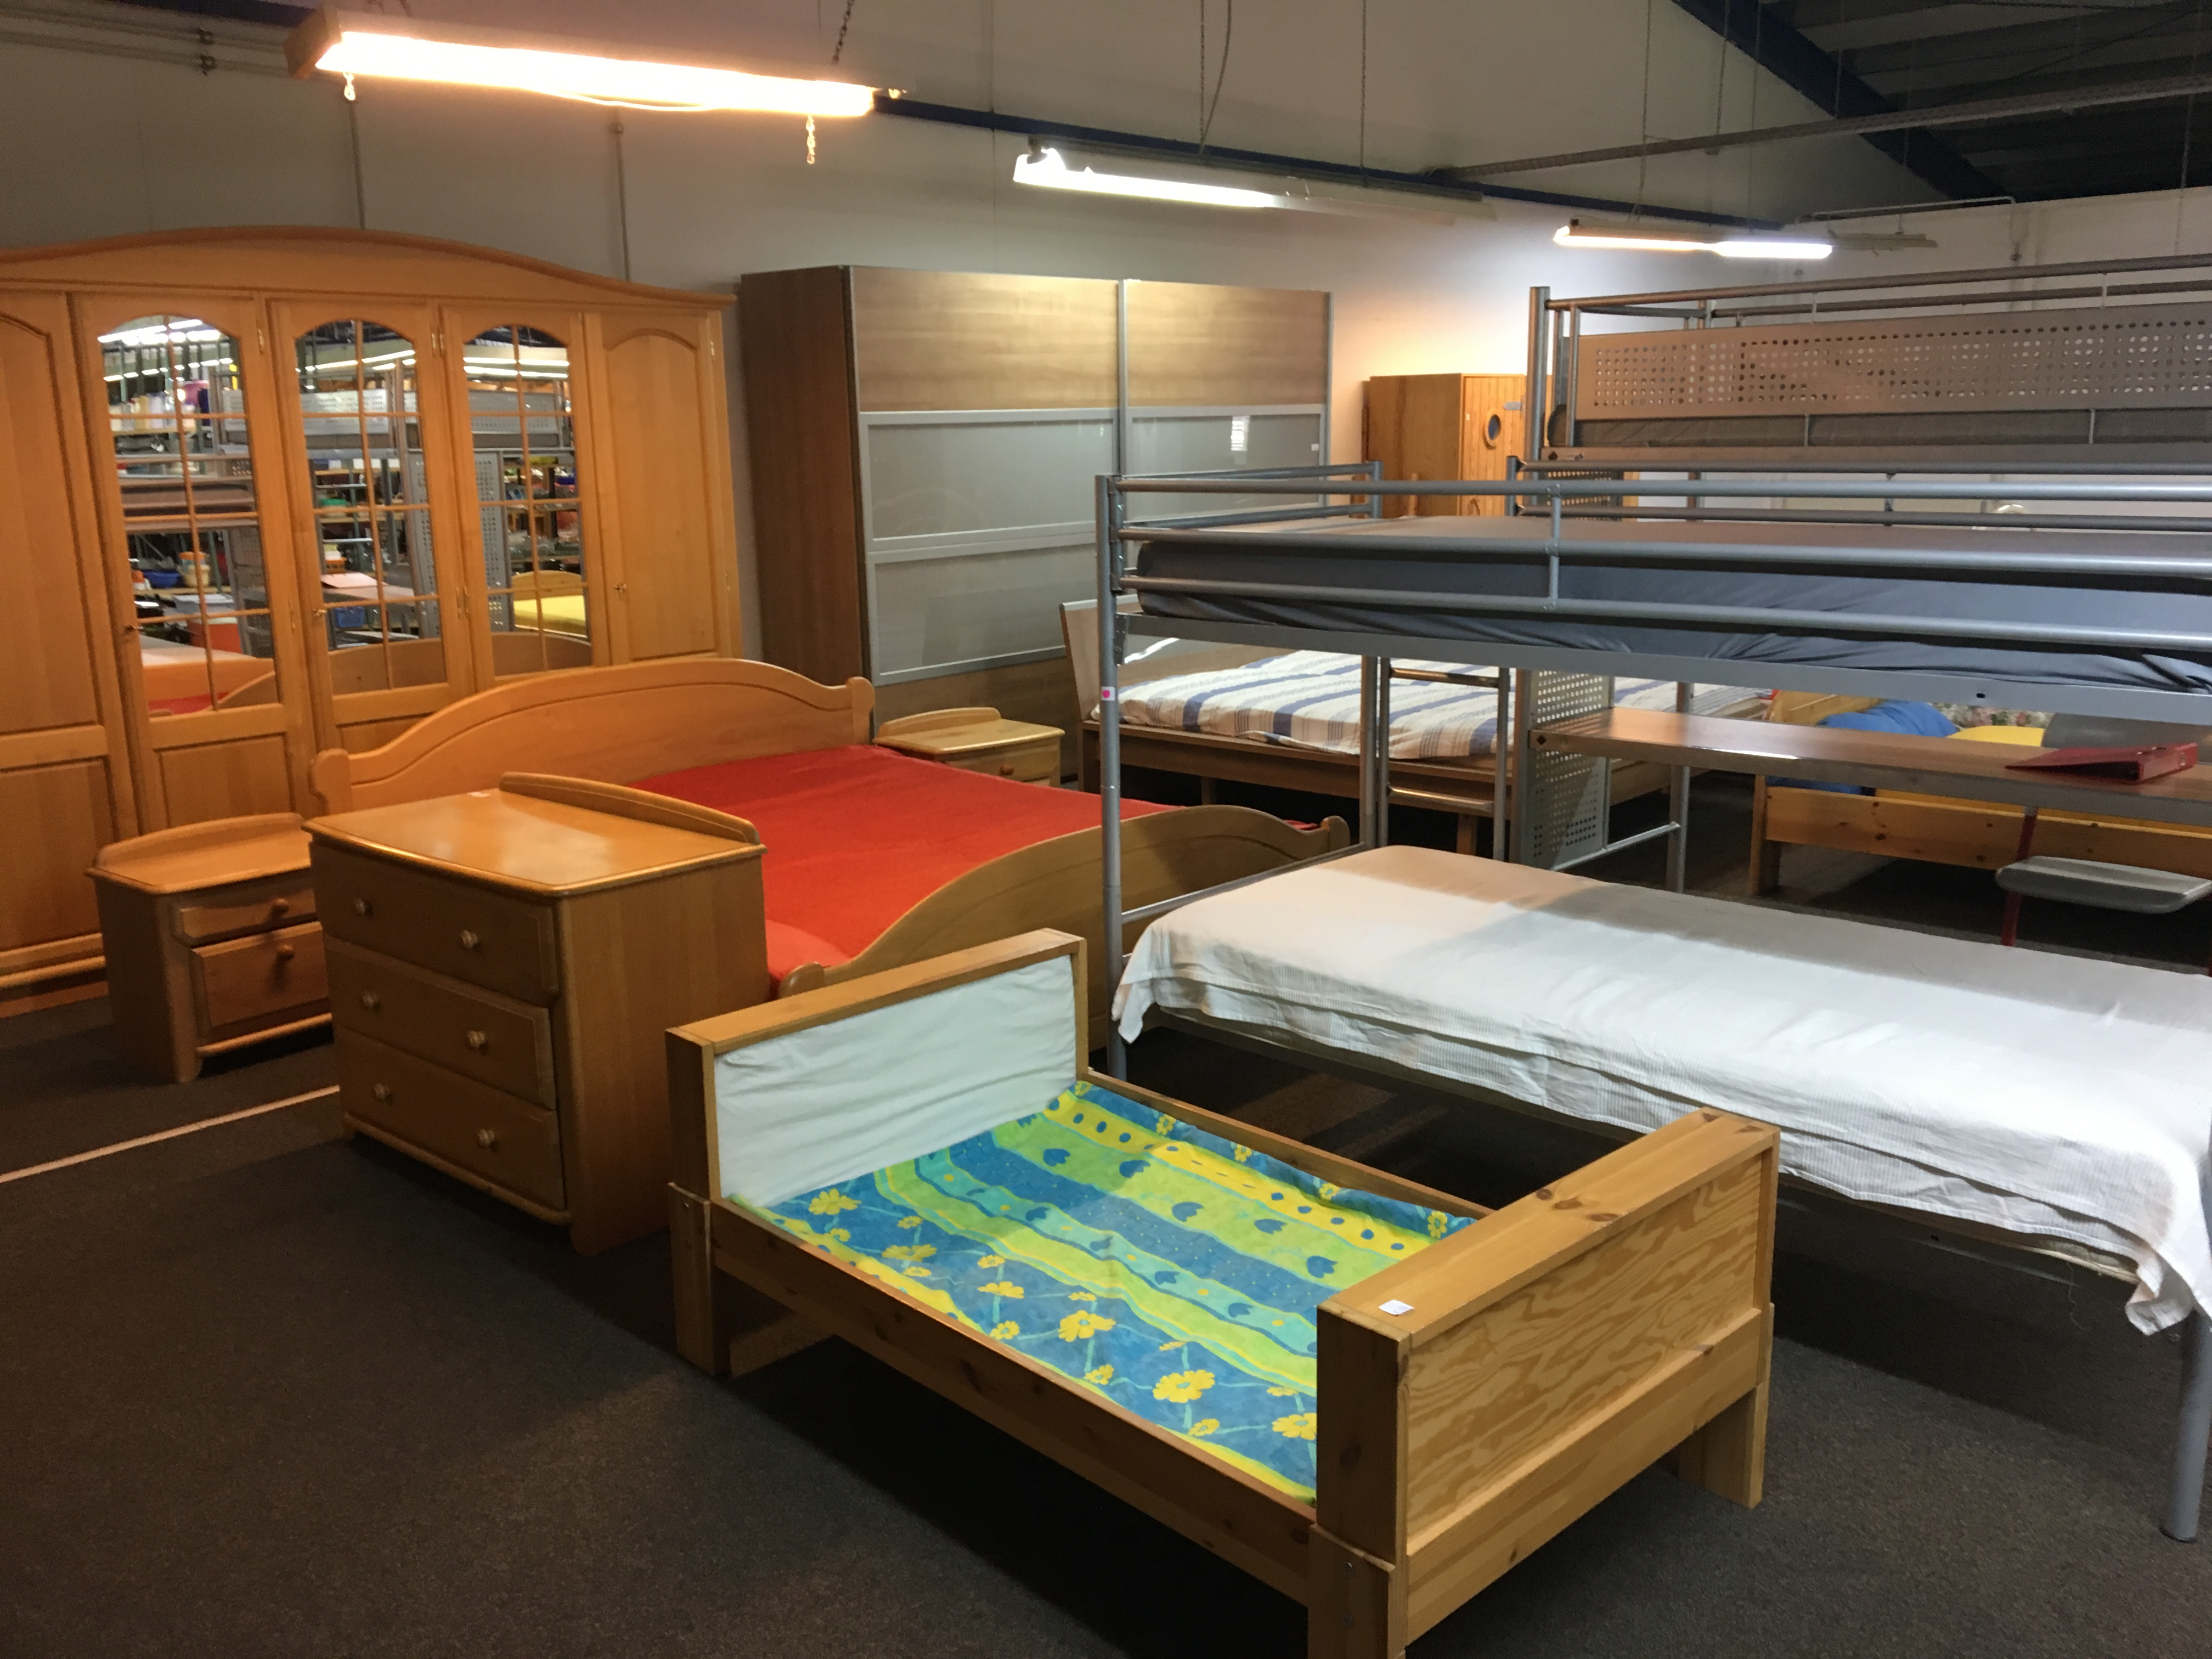 Hochbett Kinderbett gebraucht MAGAZIN bei Koblenz